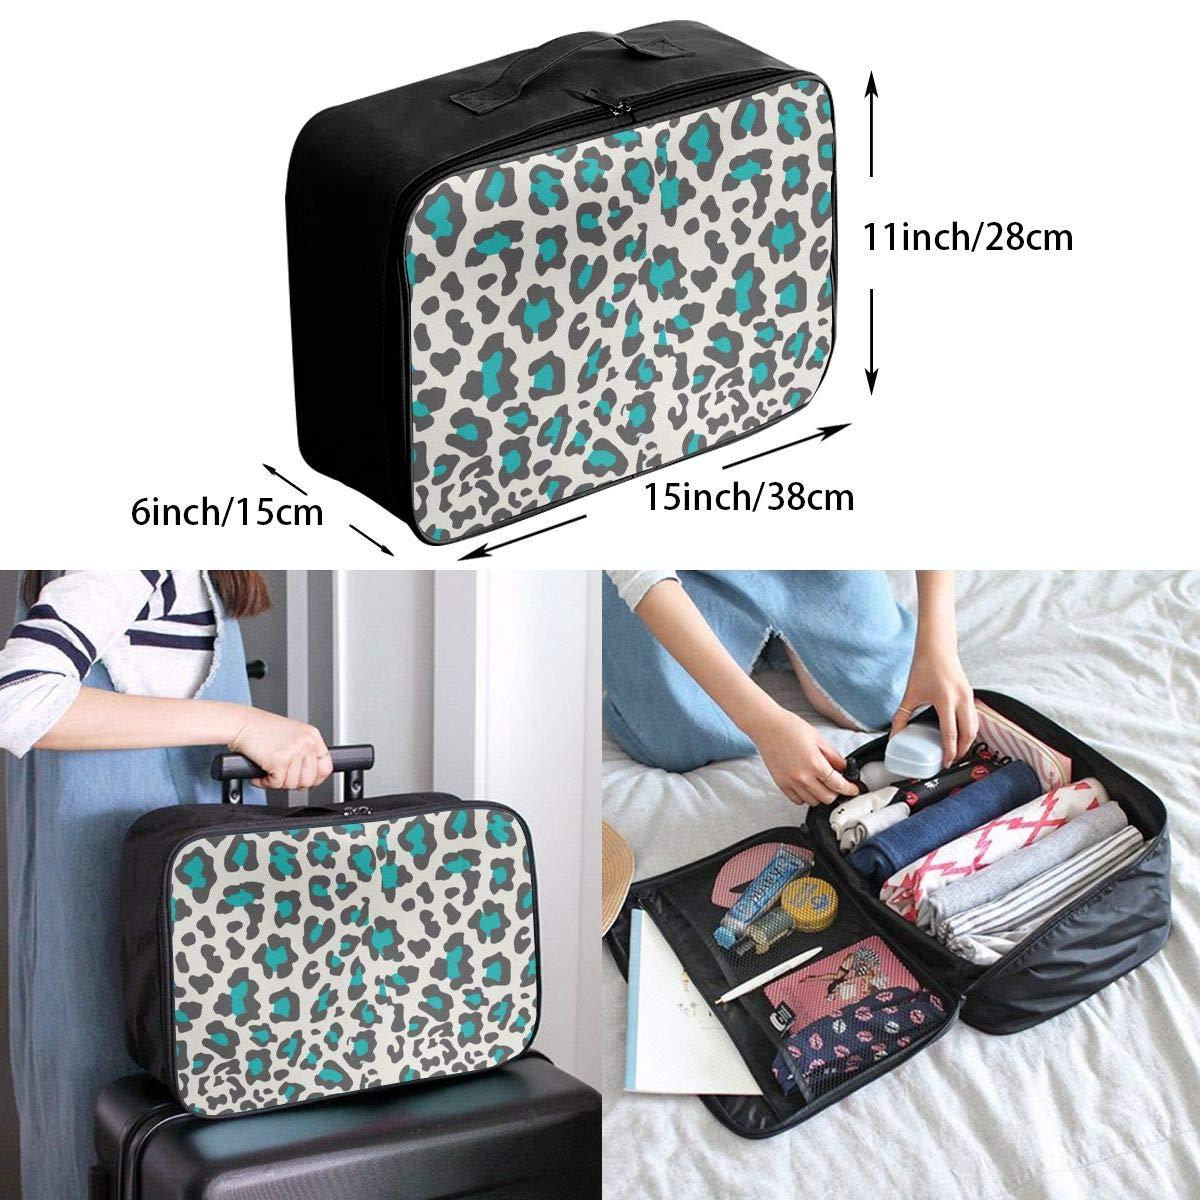 YINLAN Foldable Duffel Travel Bag Lightweight Large Capacity Portable Luggage Bag Waterproof Storage Tote Bag Cheetah Lignt Pink Leopard